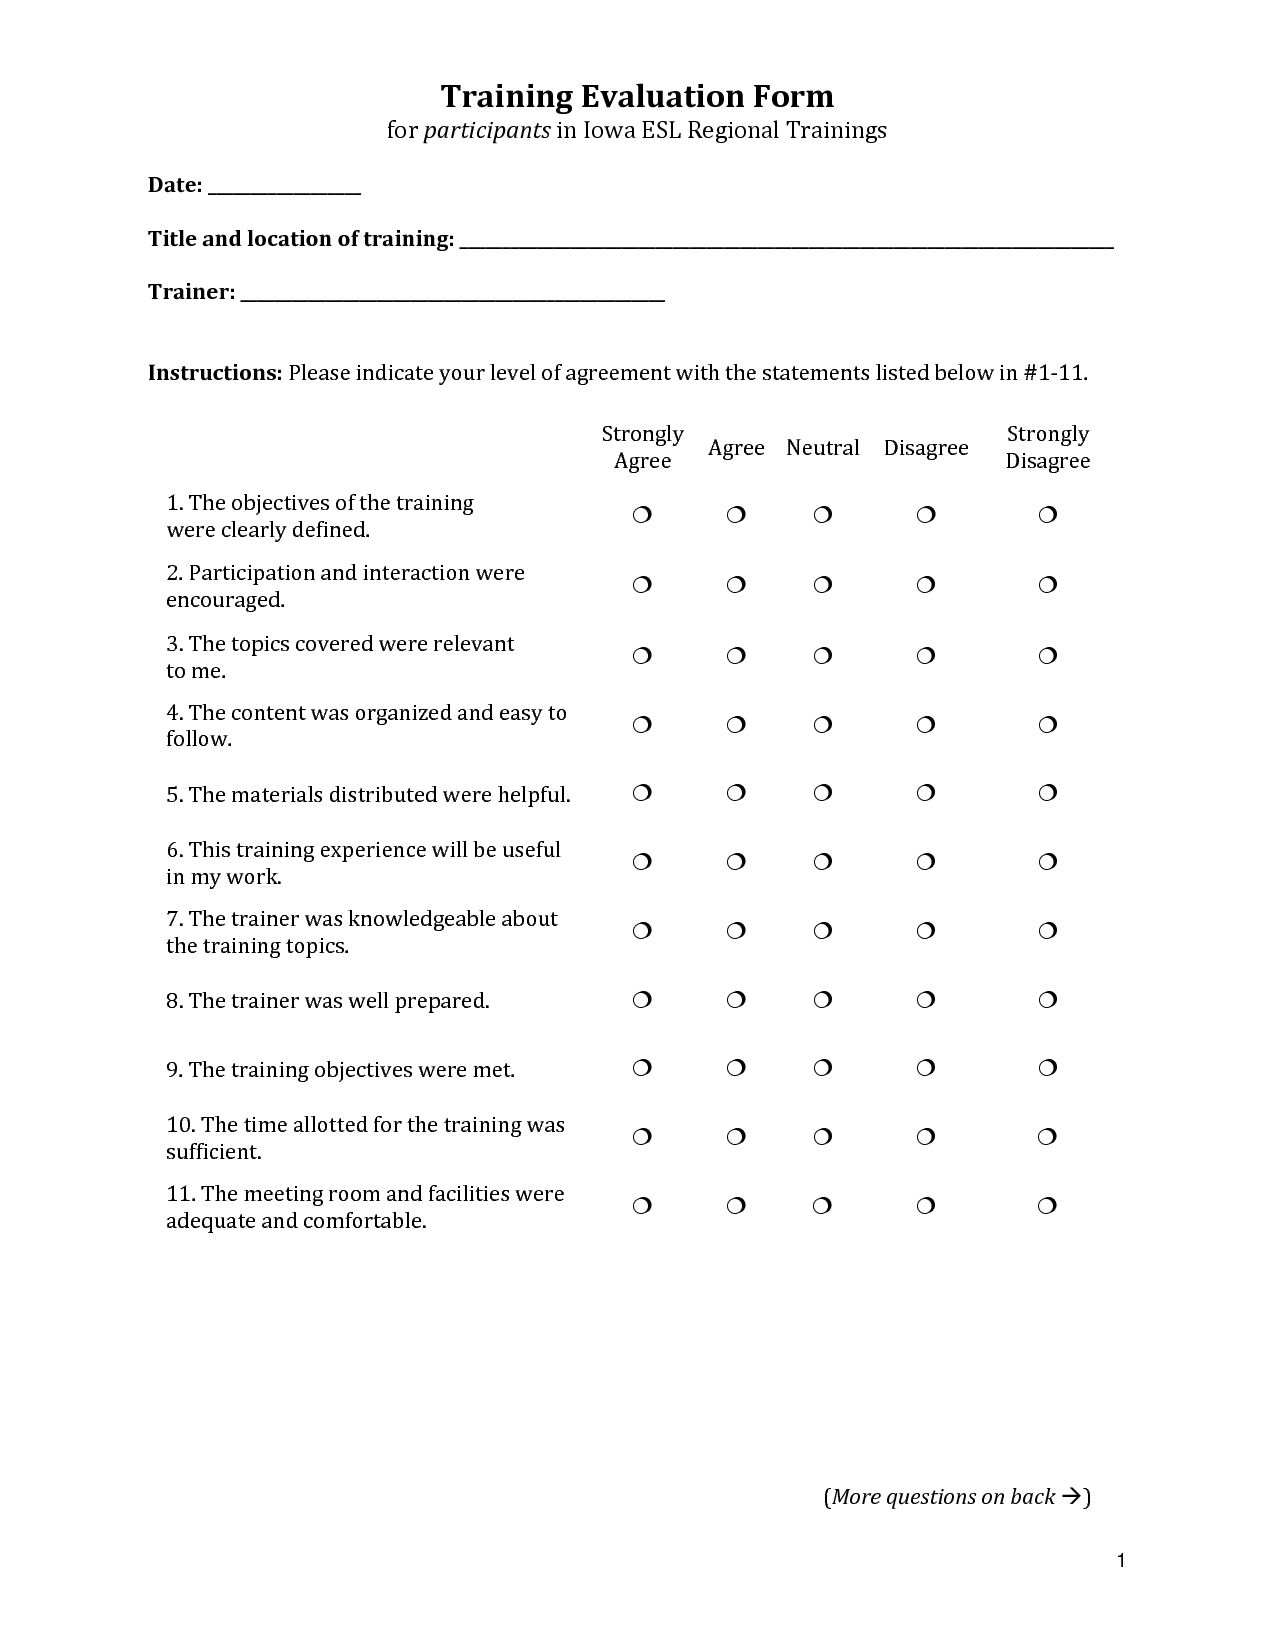 Training Evaluation Form Training Evaluation Form